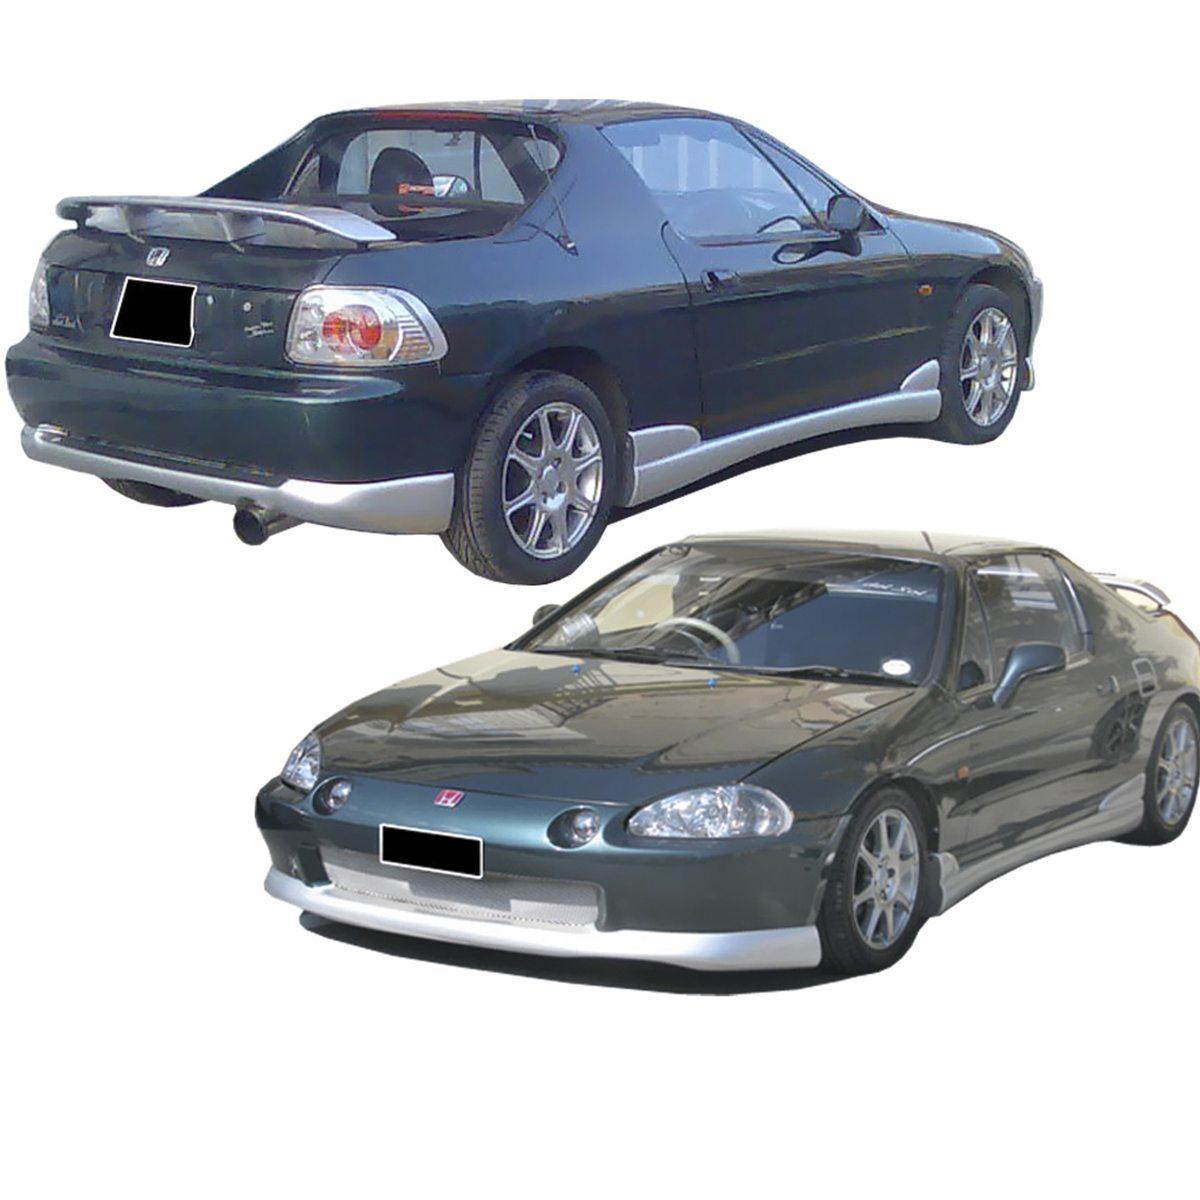 Honda-CRX-Del-Sol-KIT-KTR014